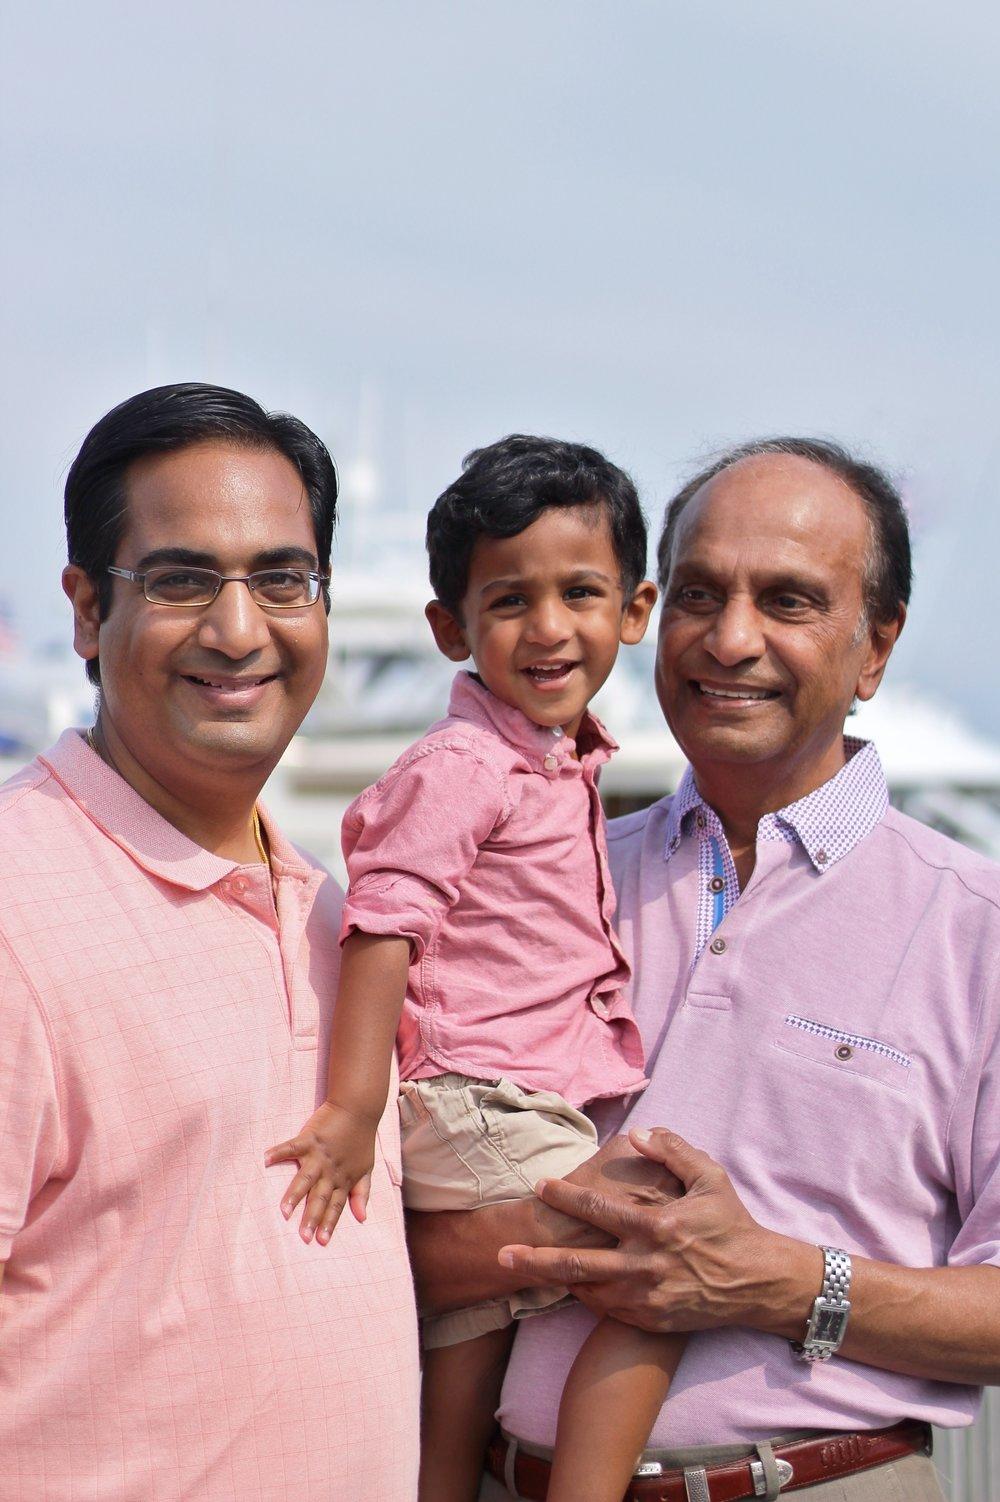 Patel Family Traverse City August 2018 (44).JPG